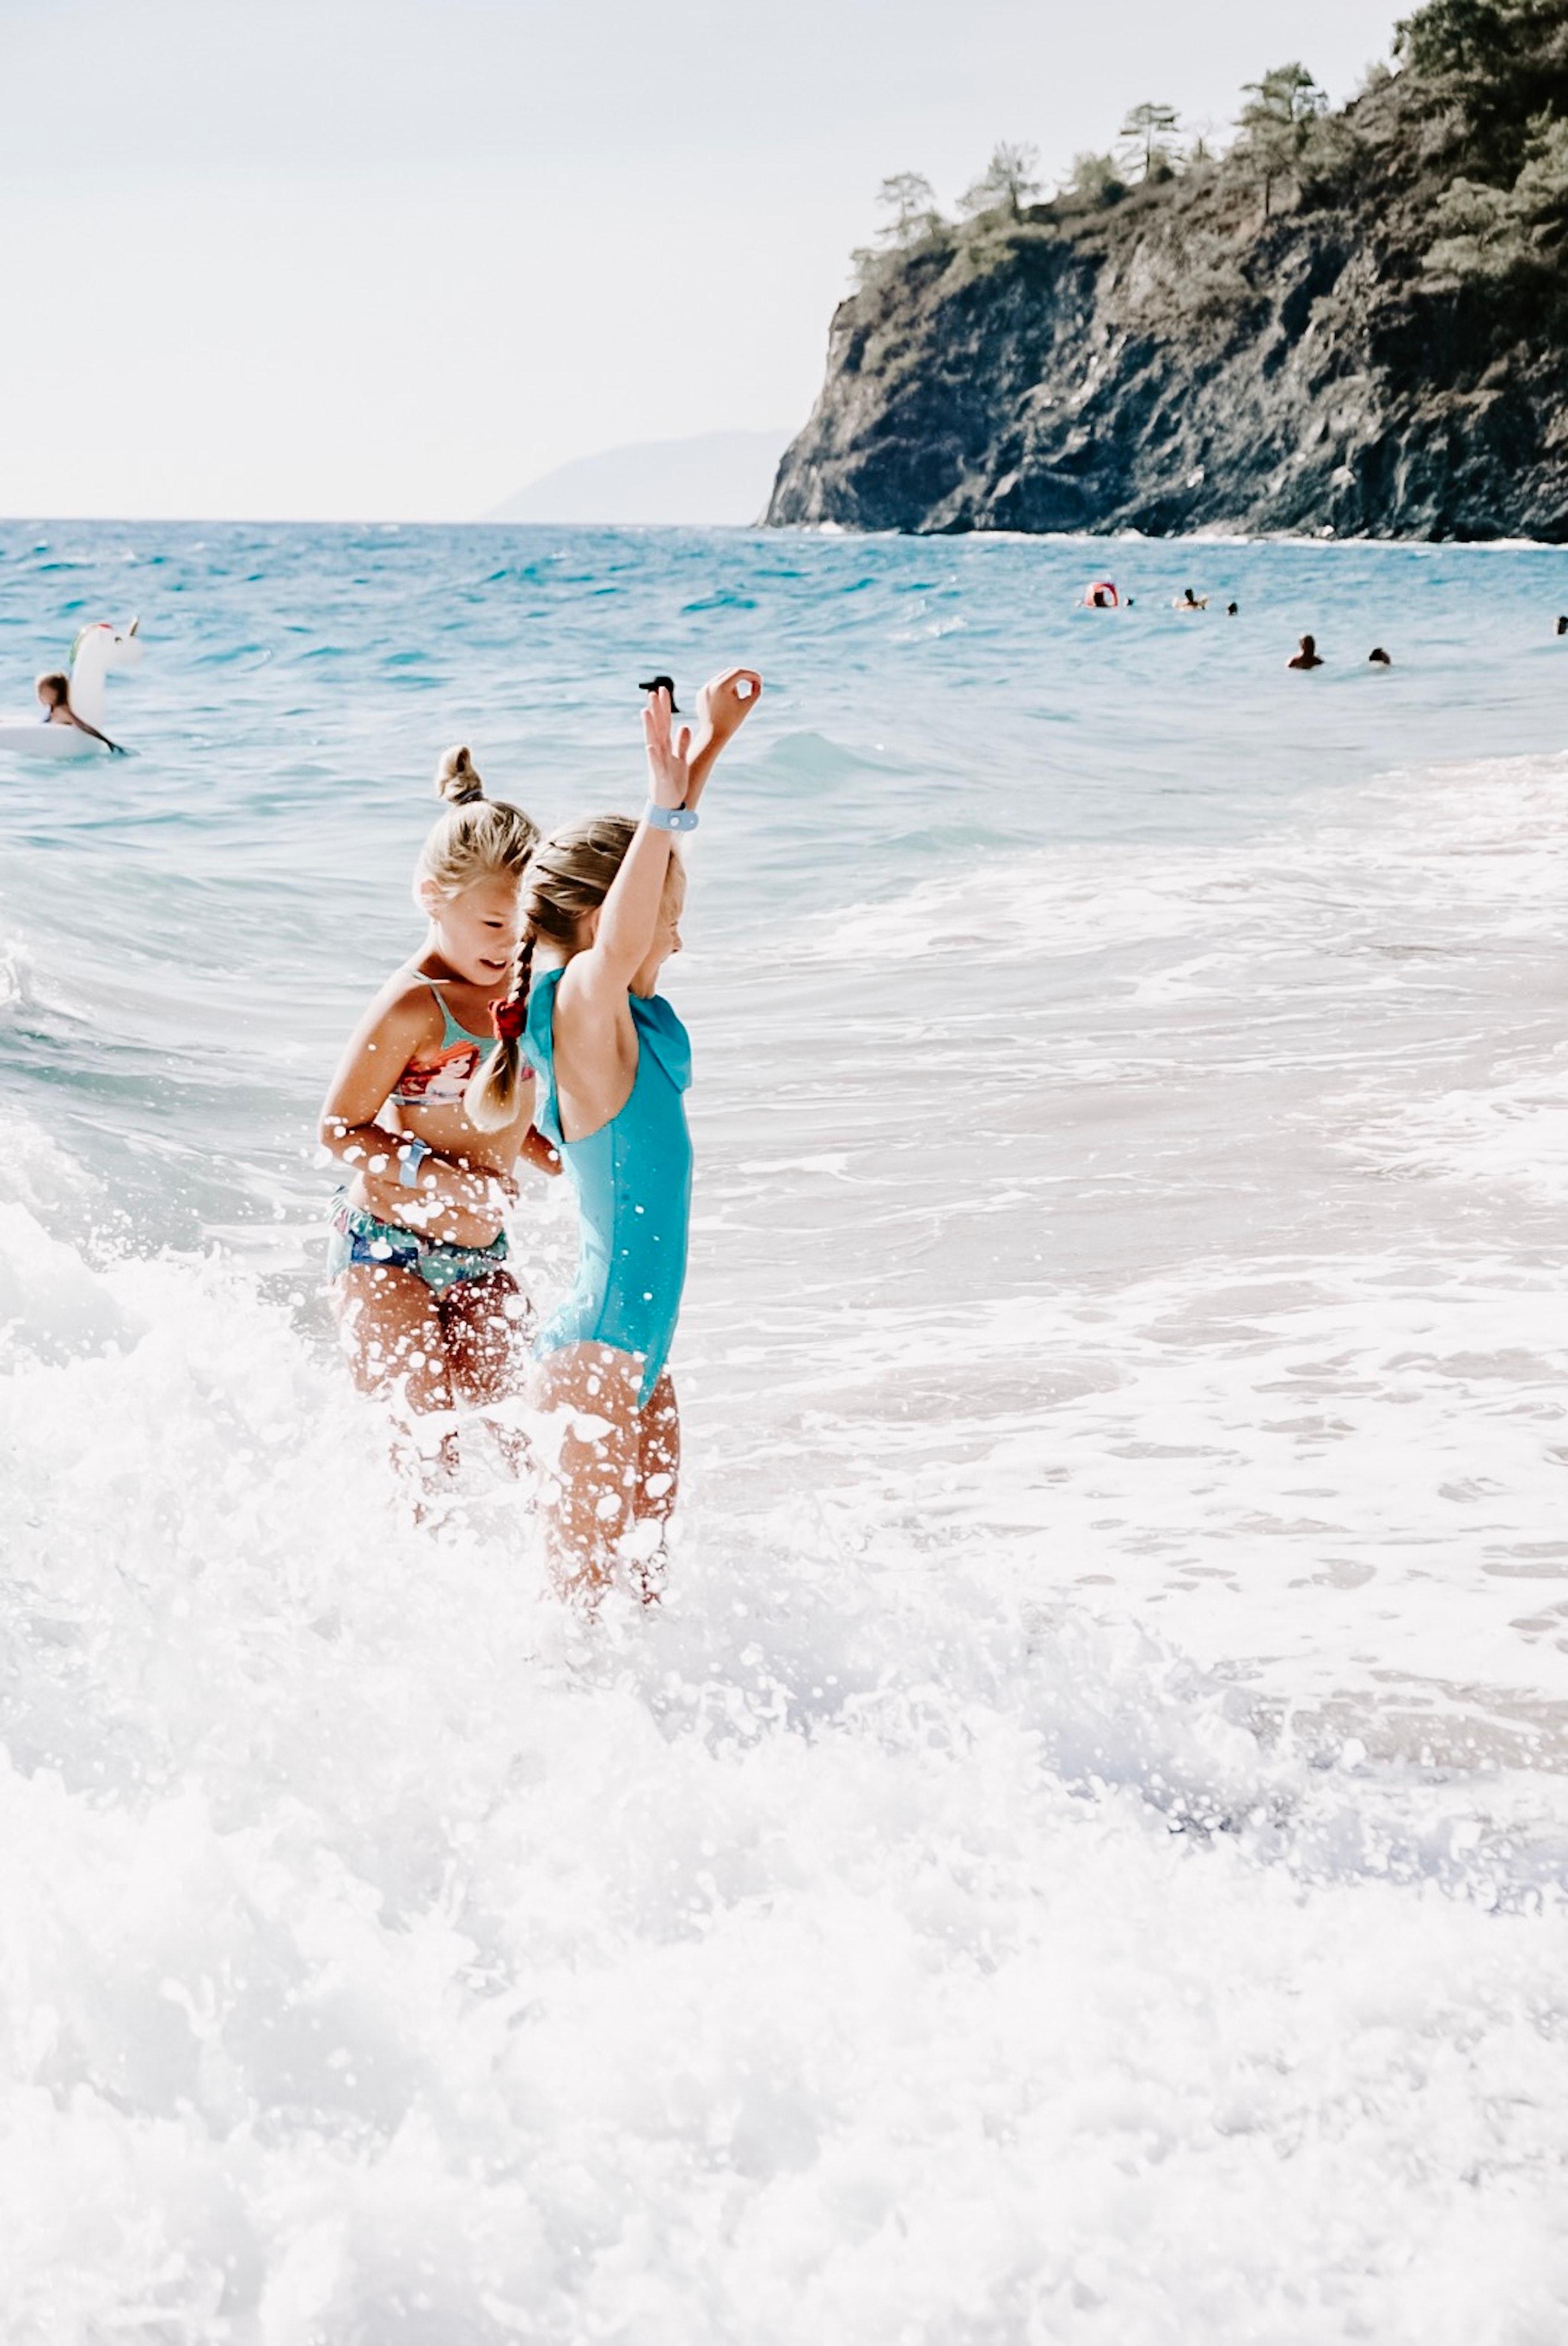 Summer surprise trip - Vakantieadres Onbekend